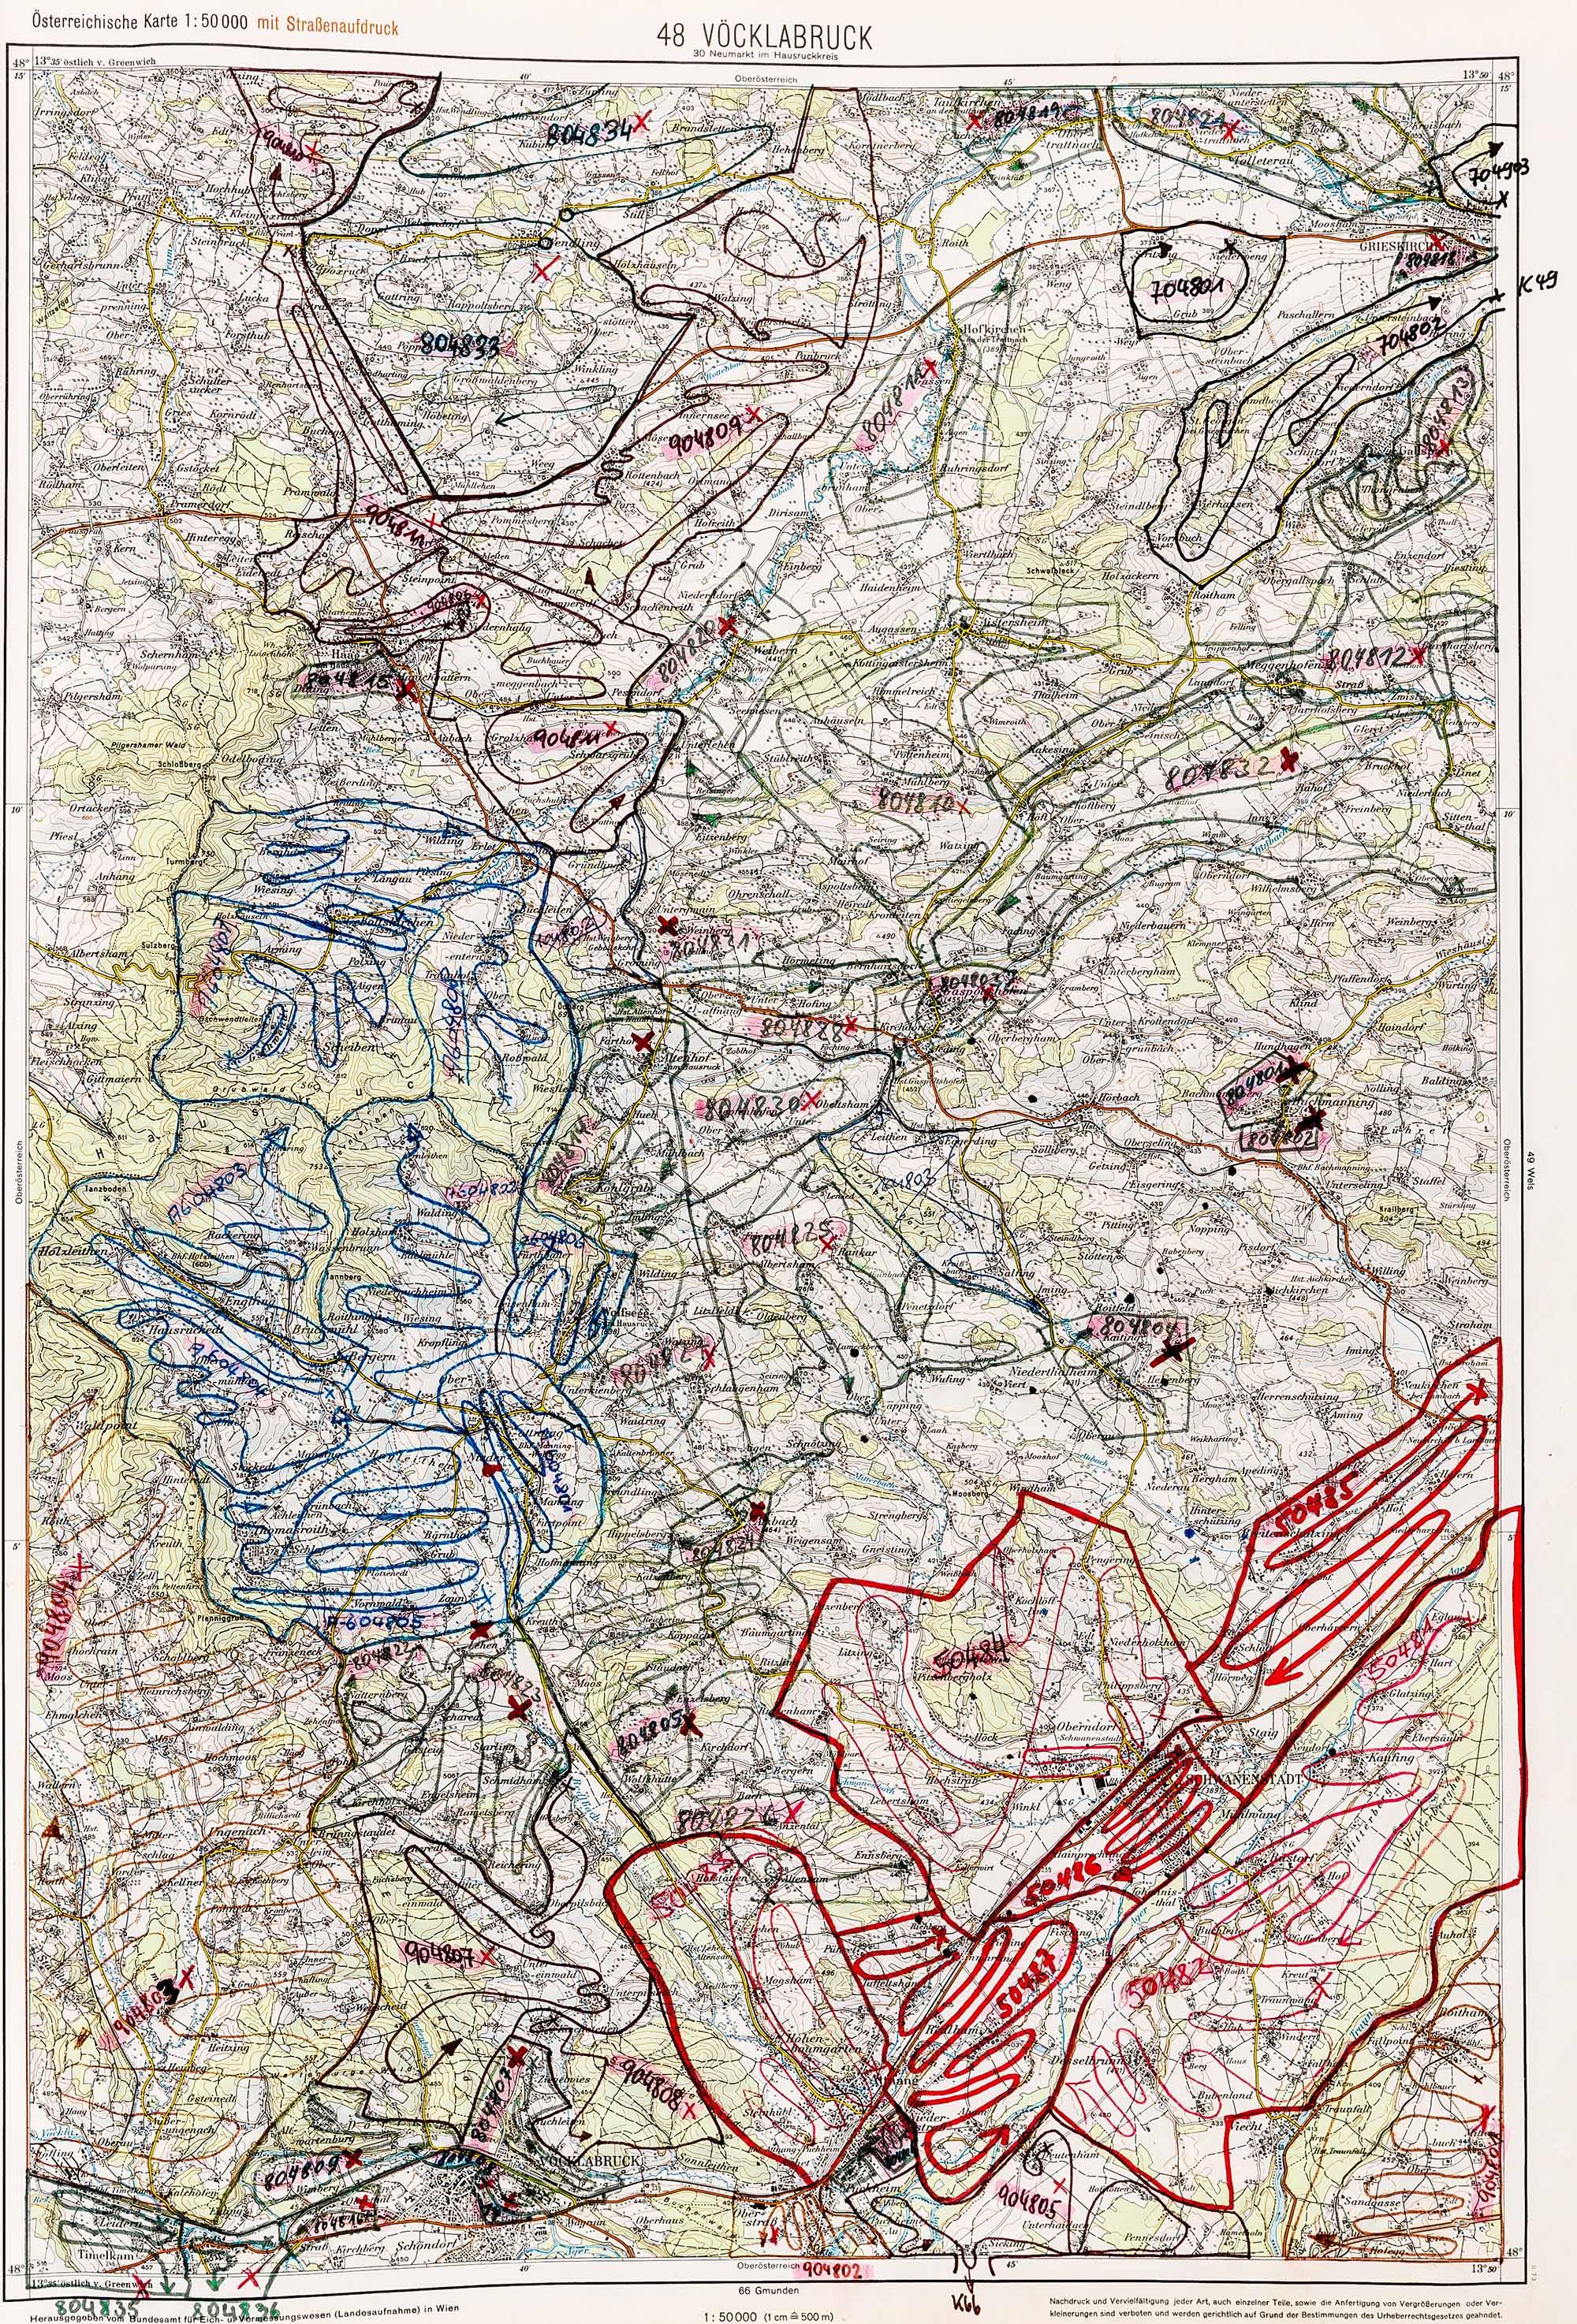 1975-1979 Karte 048